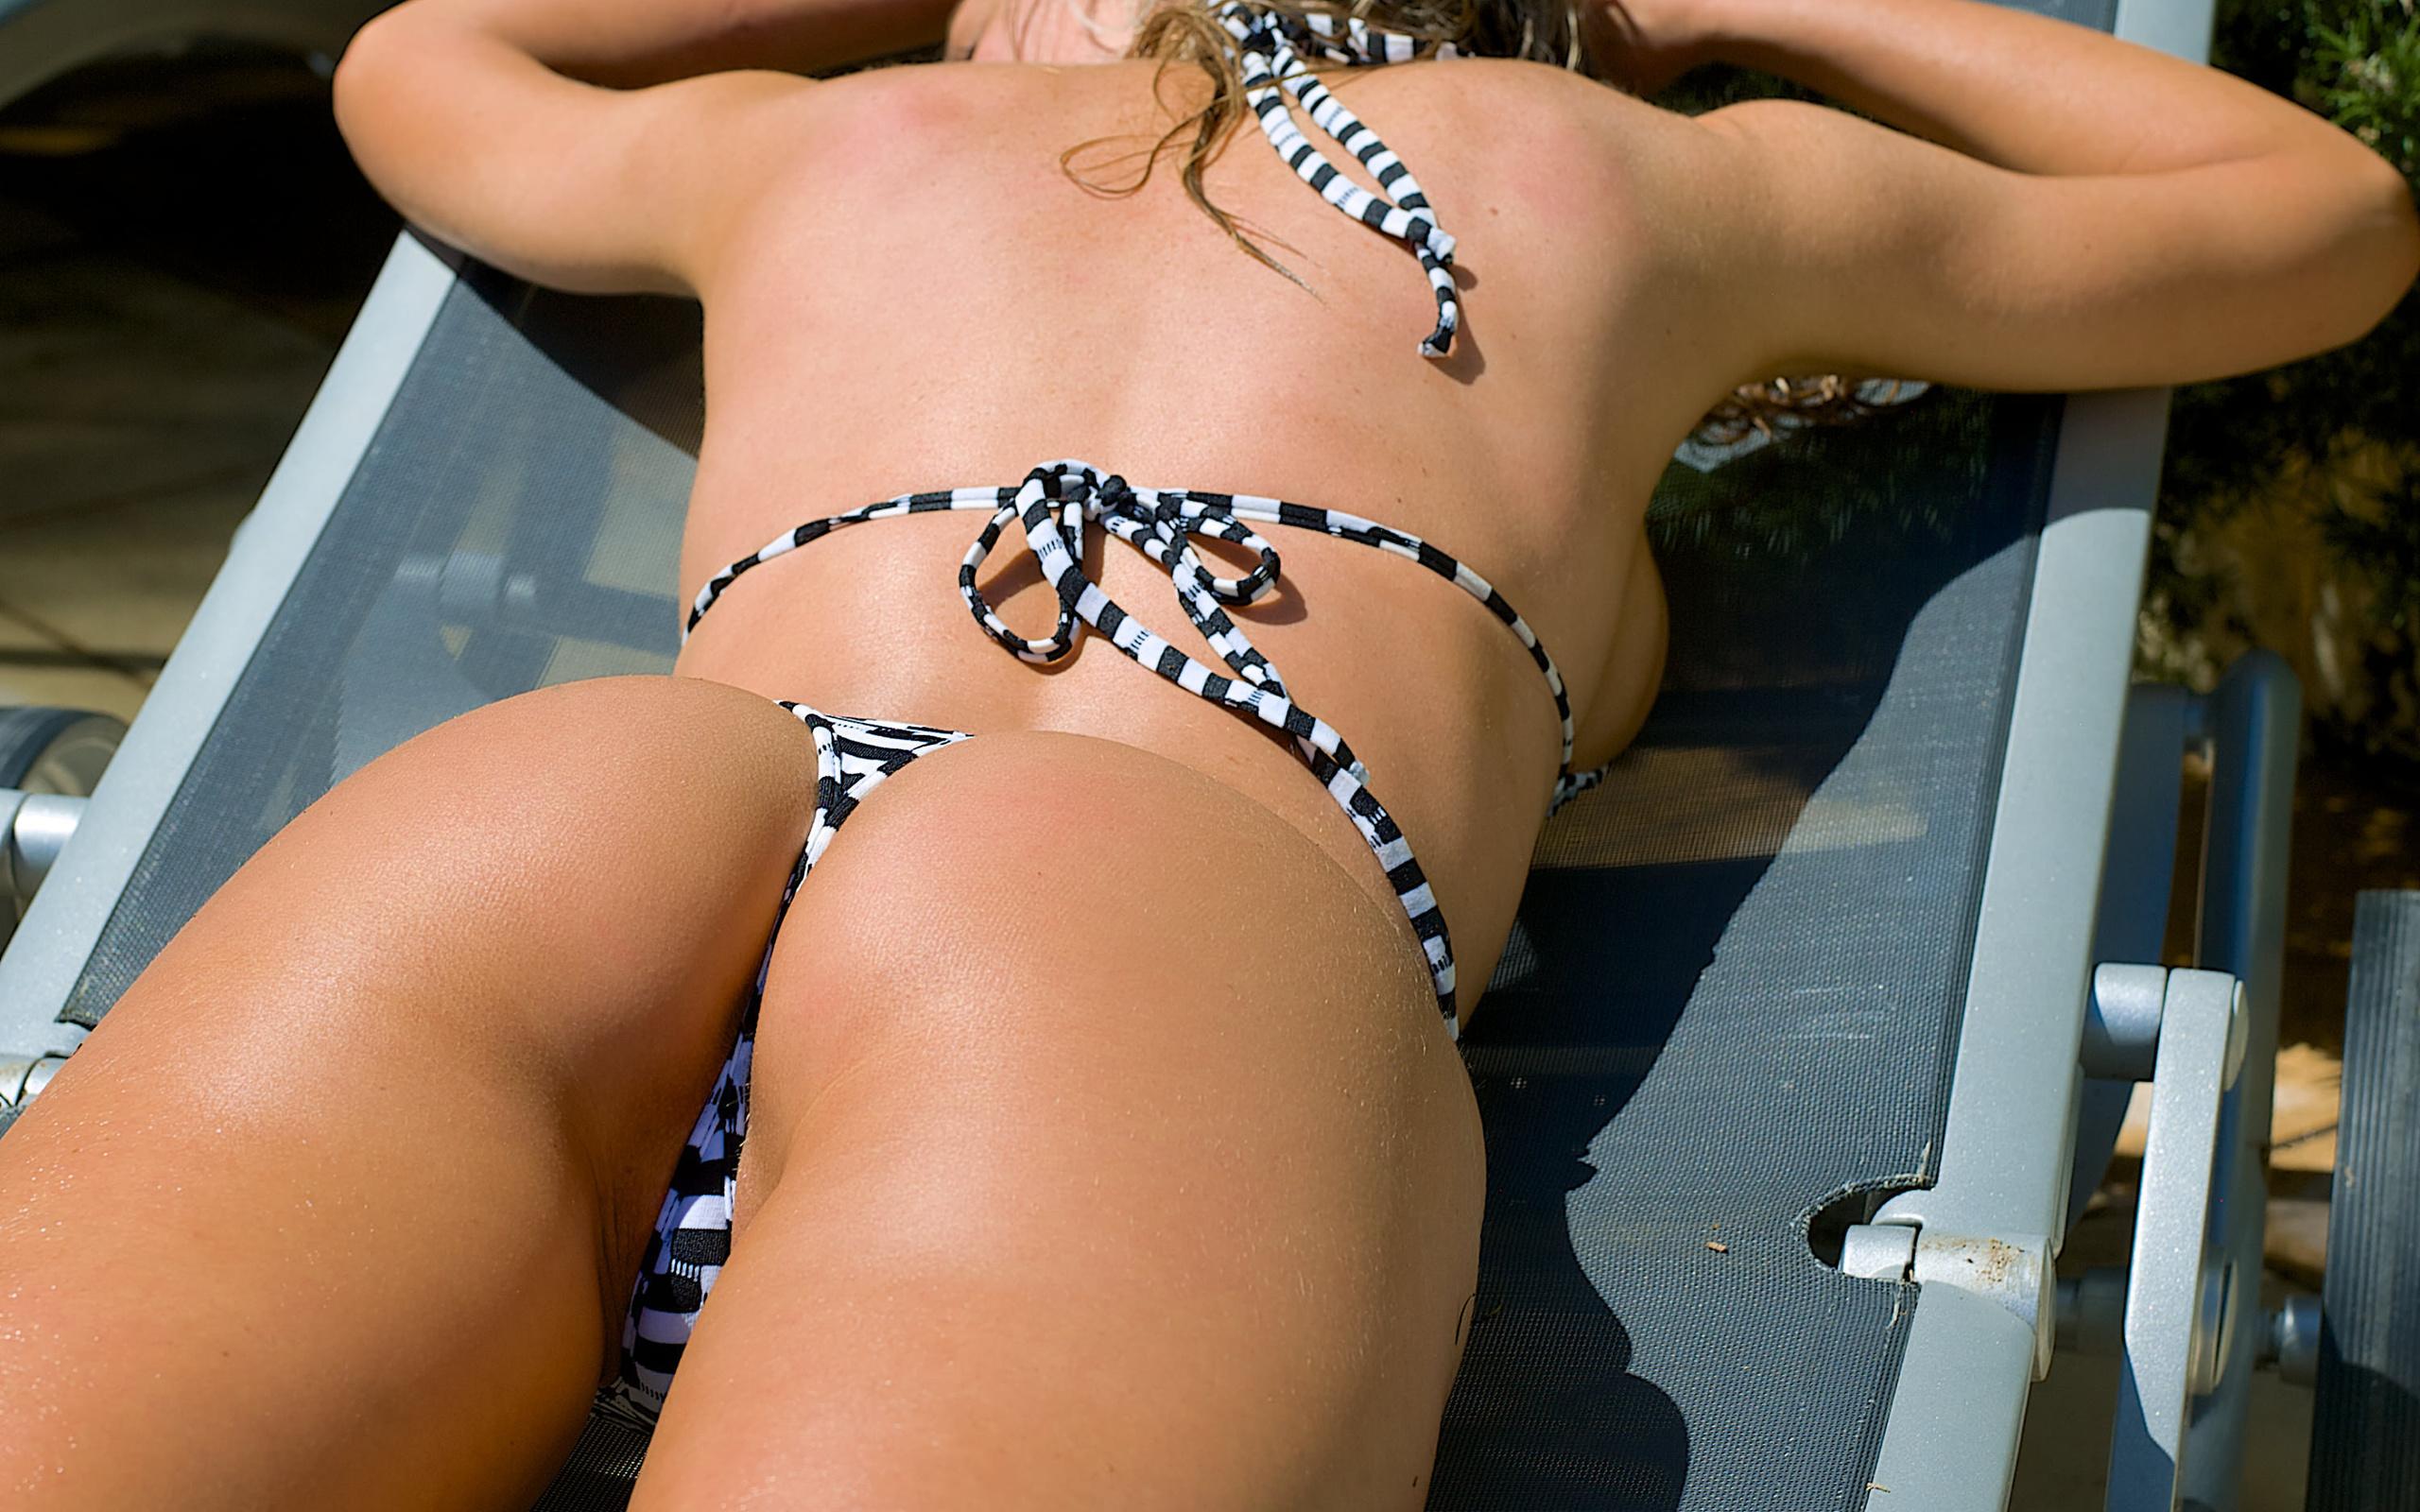 Redhead Bikini Squirt Pics